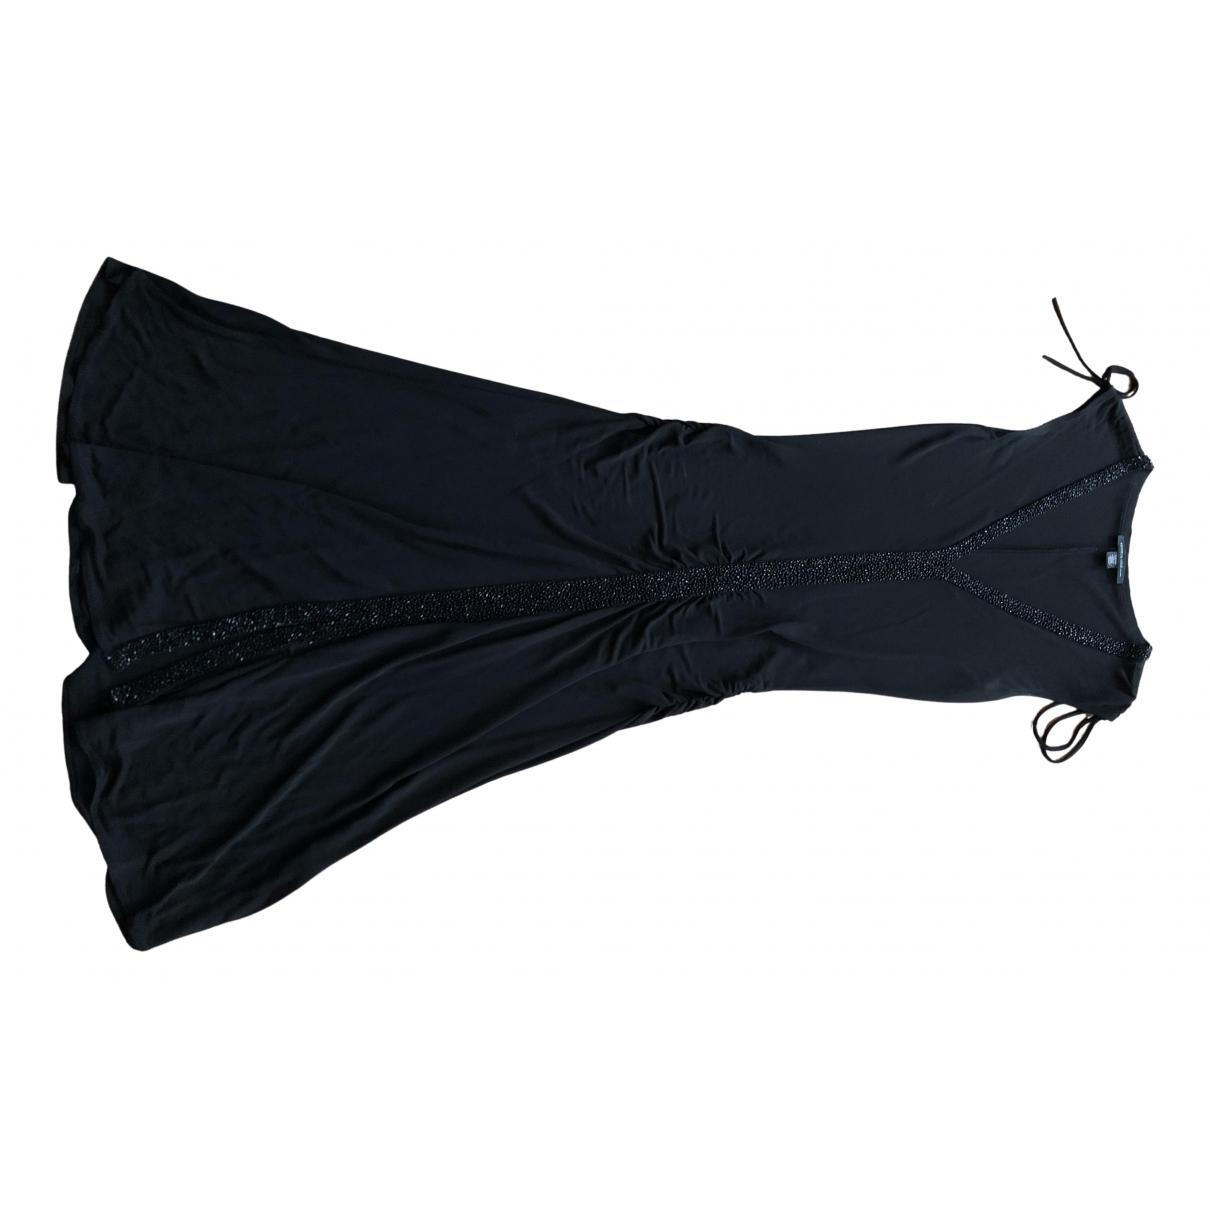 Kenneth Cole \N Kleid in  Schwarz Baumwolle - Elasthan